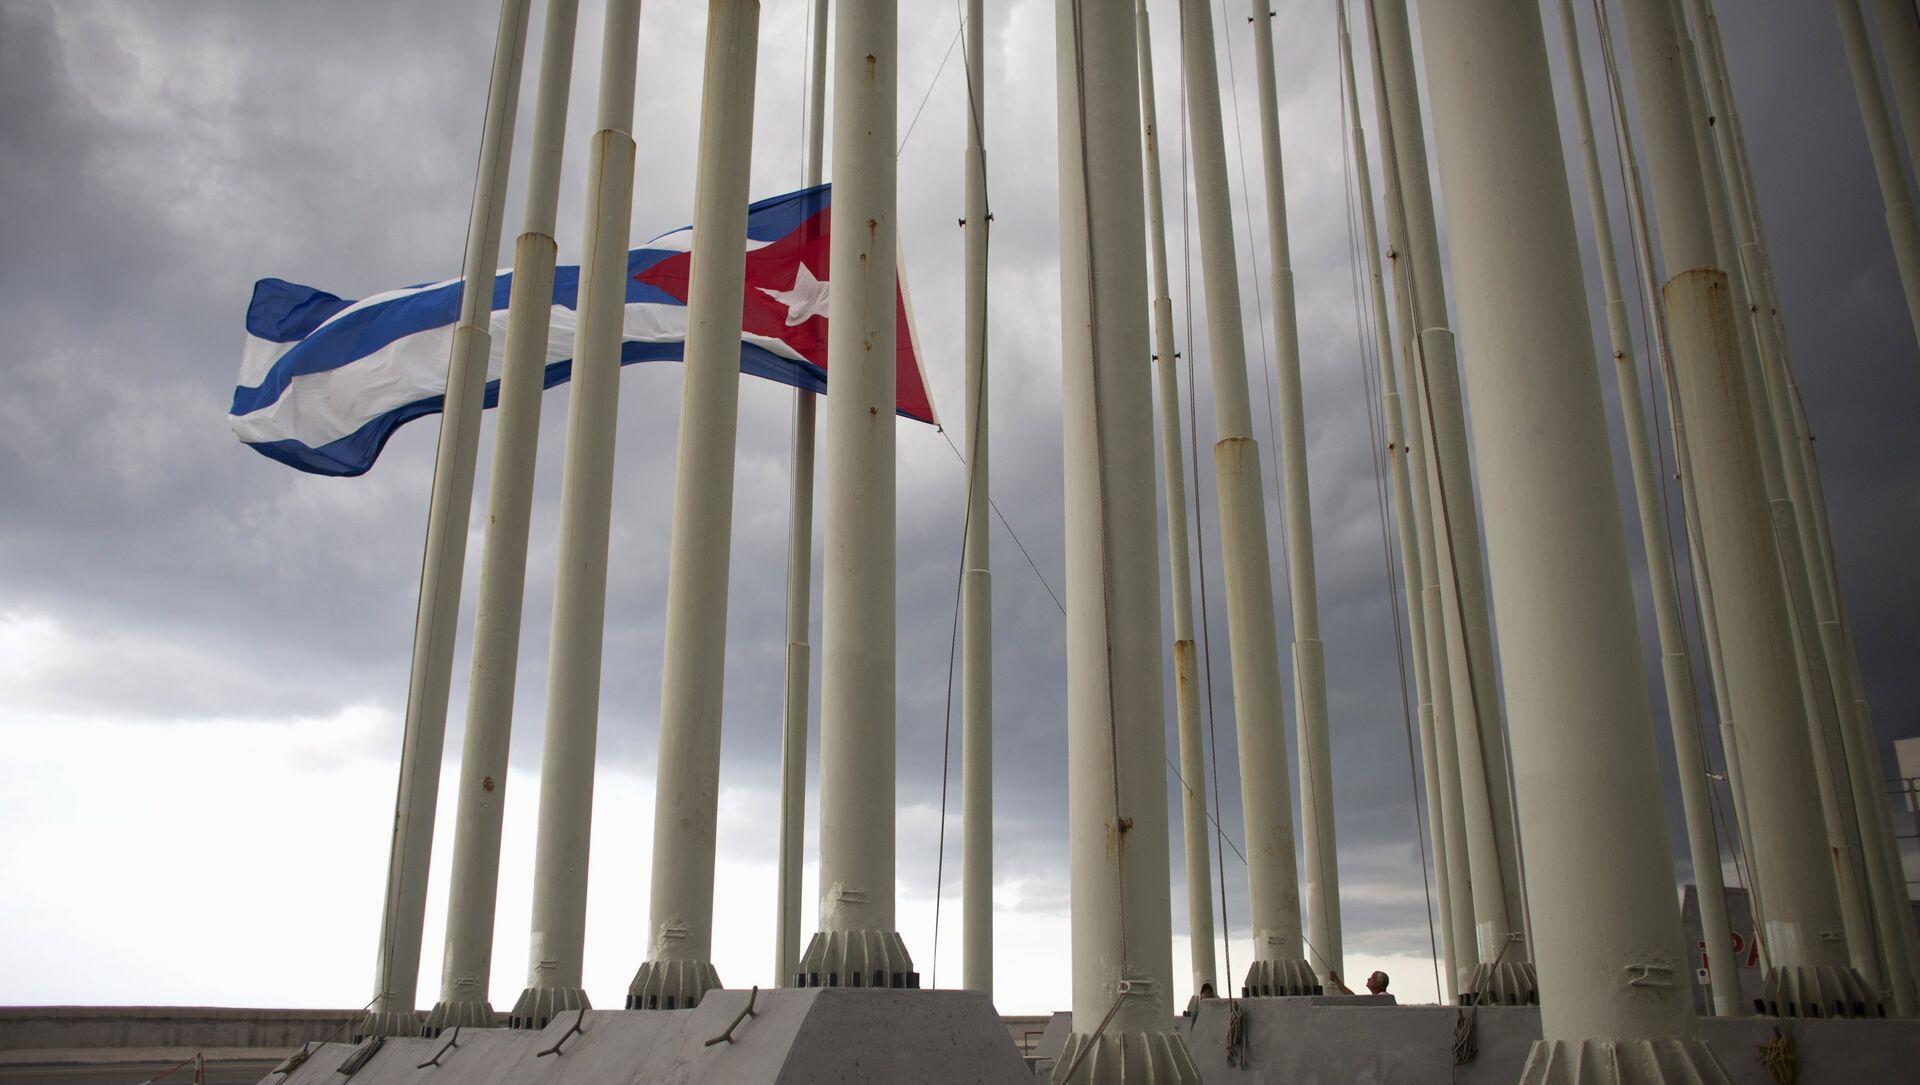 A man lowers the Cuban flag in Havana, August 15, 2015 - Sputnik Mundo, 1920, 09.02.2021